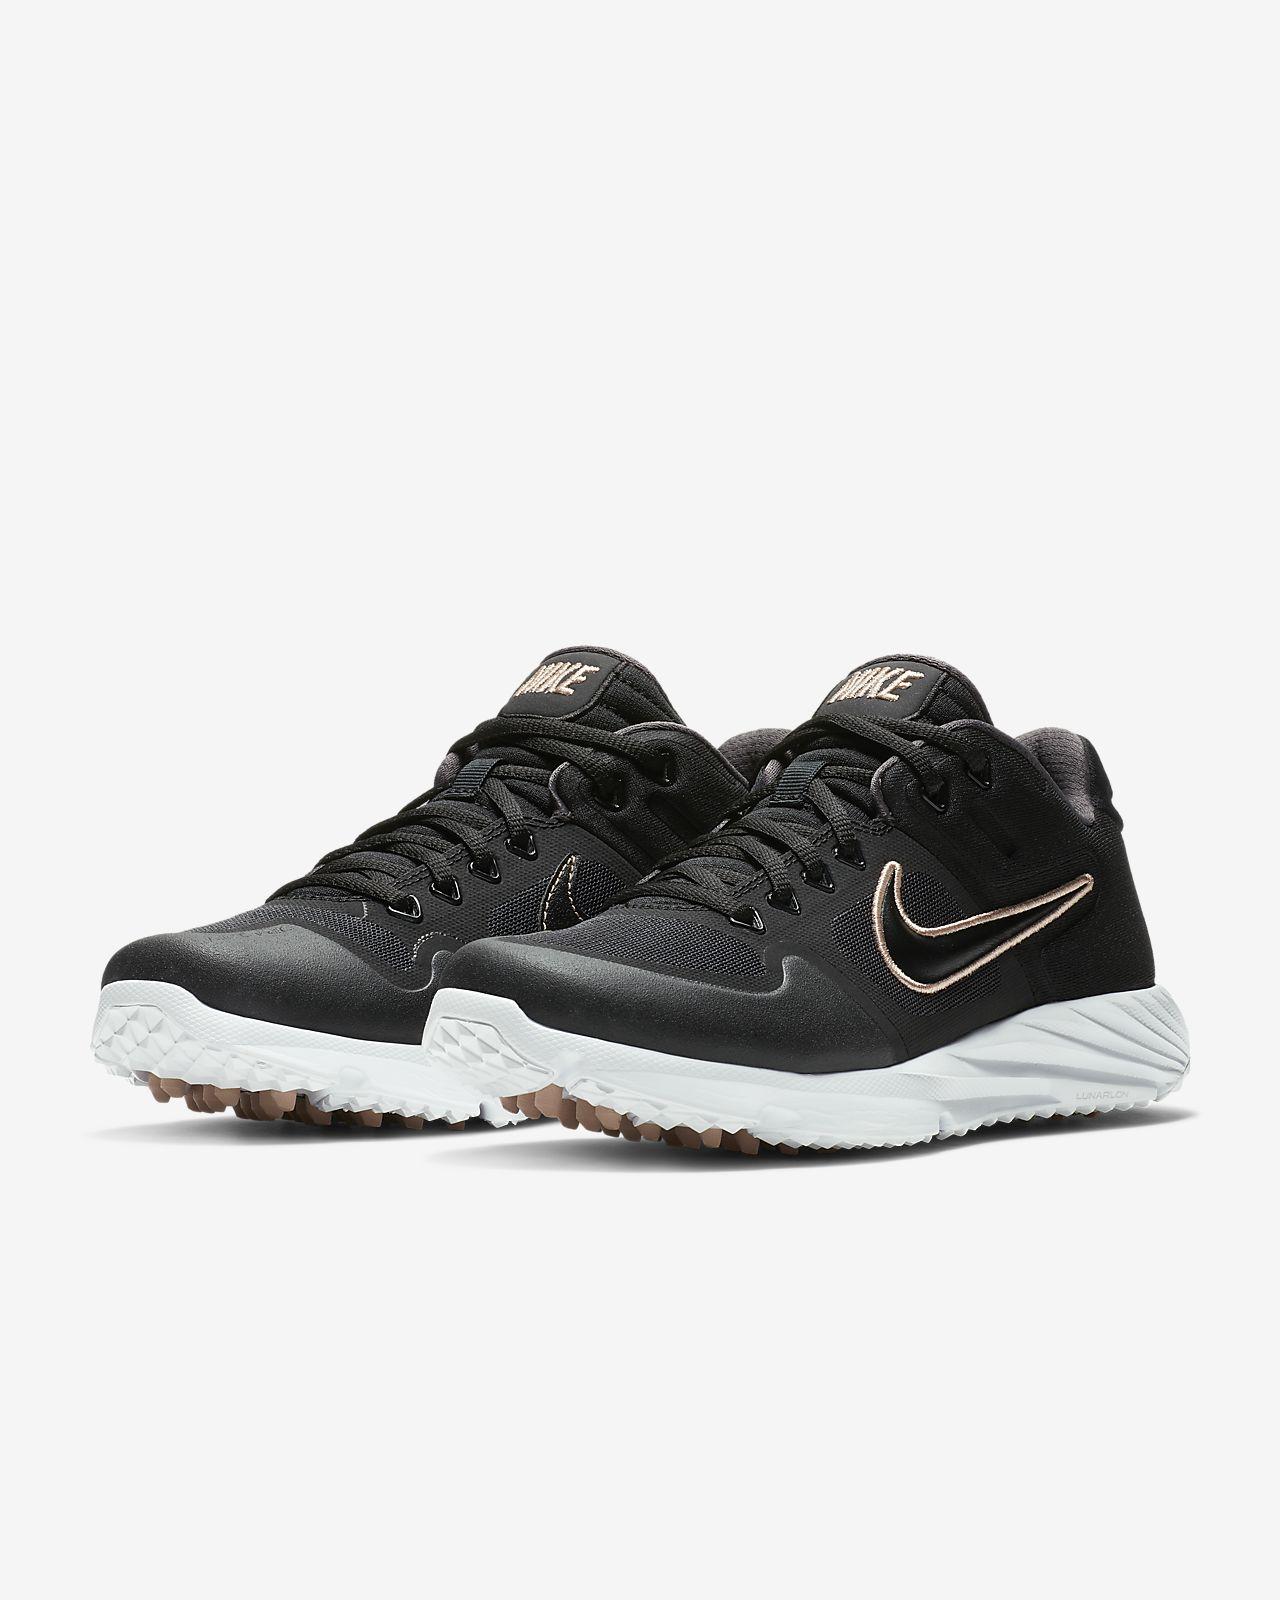 316888e5f Nike Alpha Huarache Elite 2 Turf Women s Softball Shoe. Nike.com